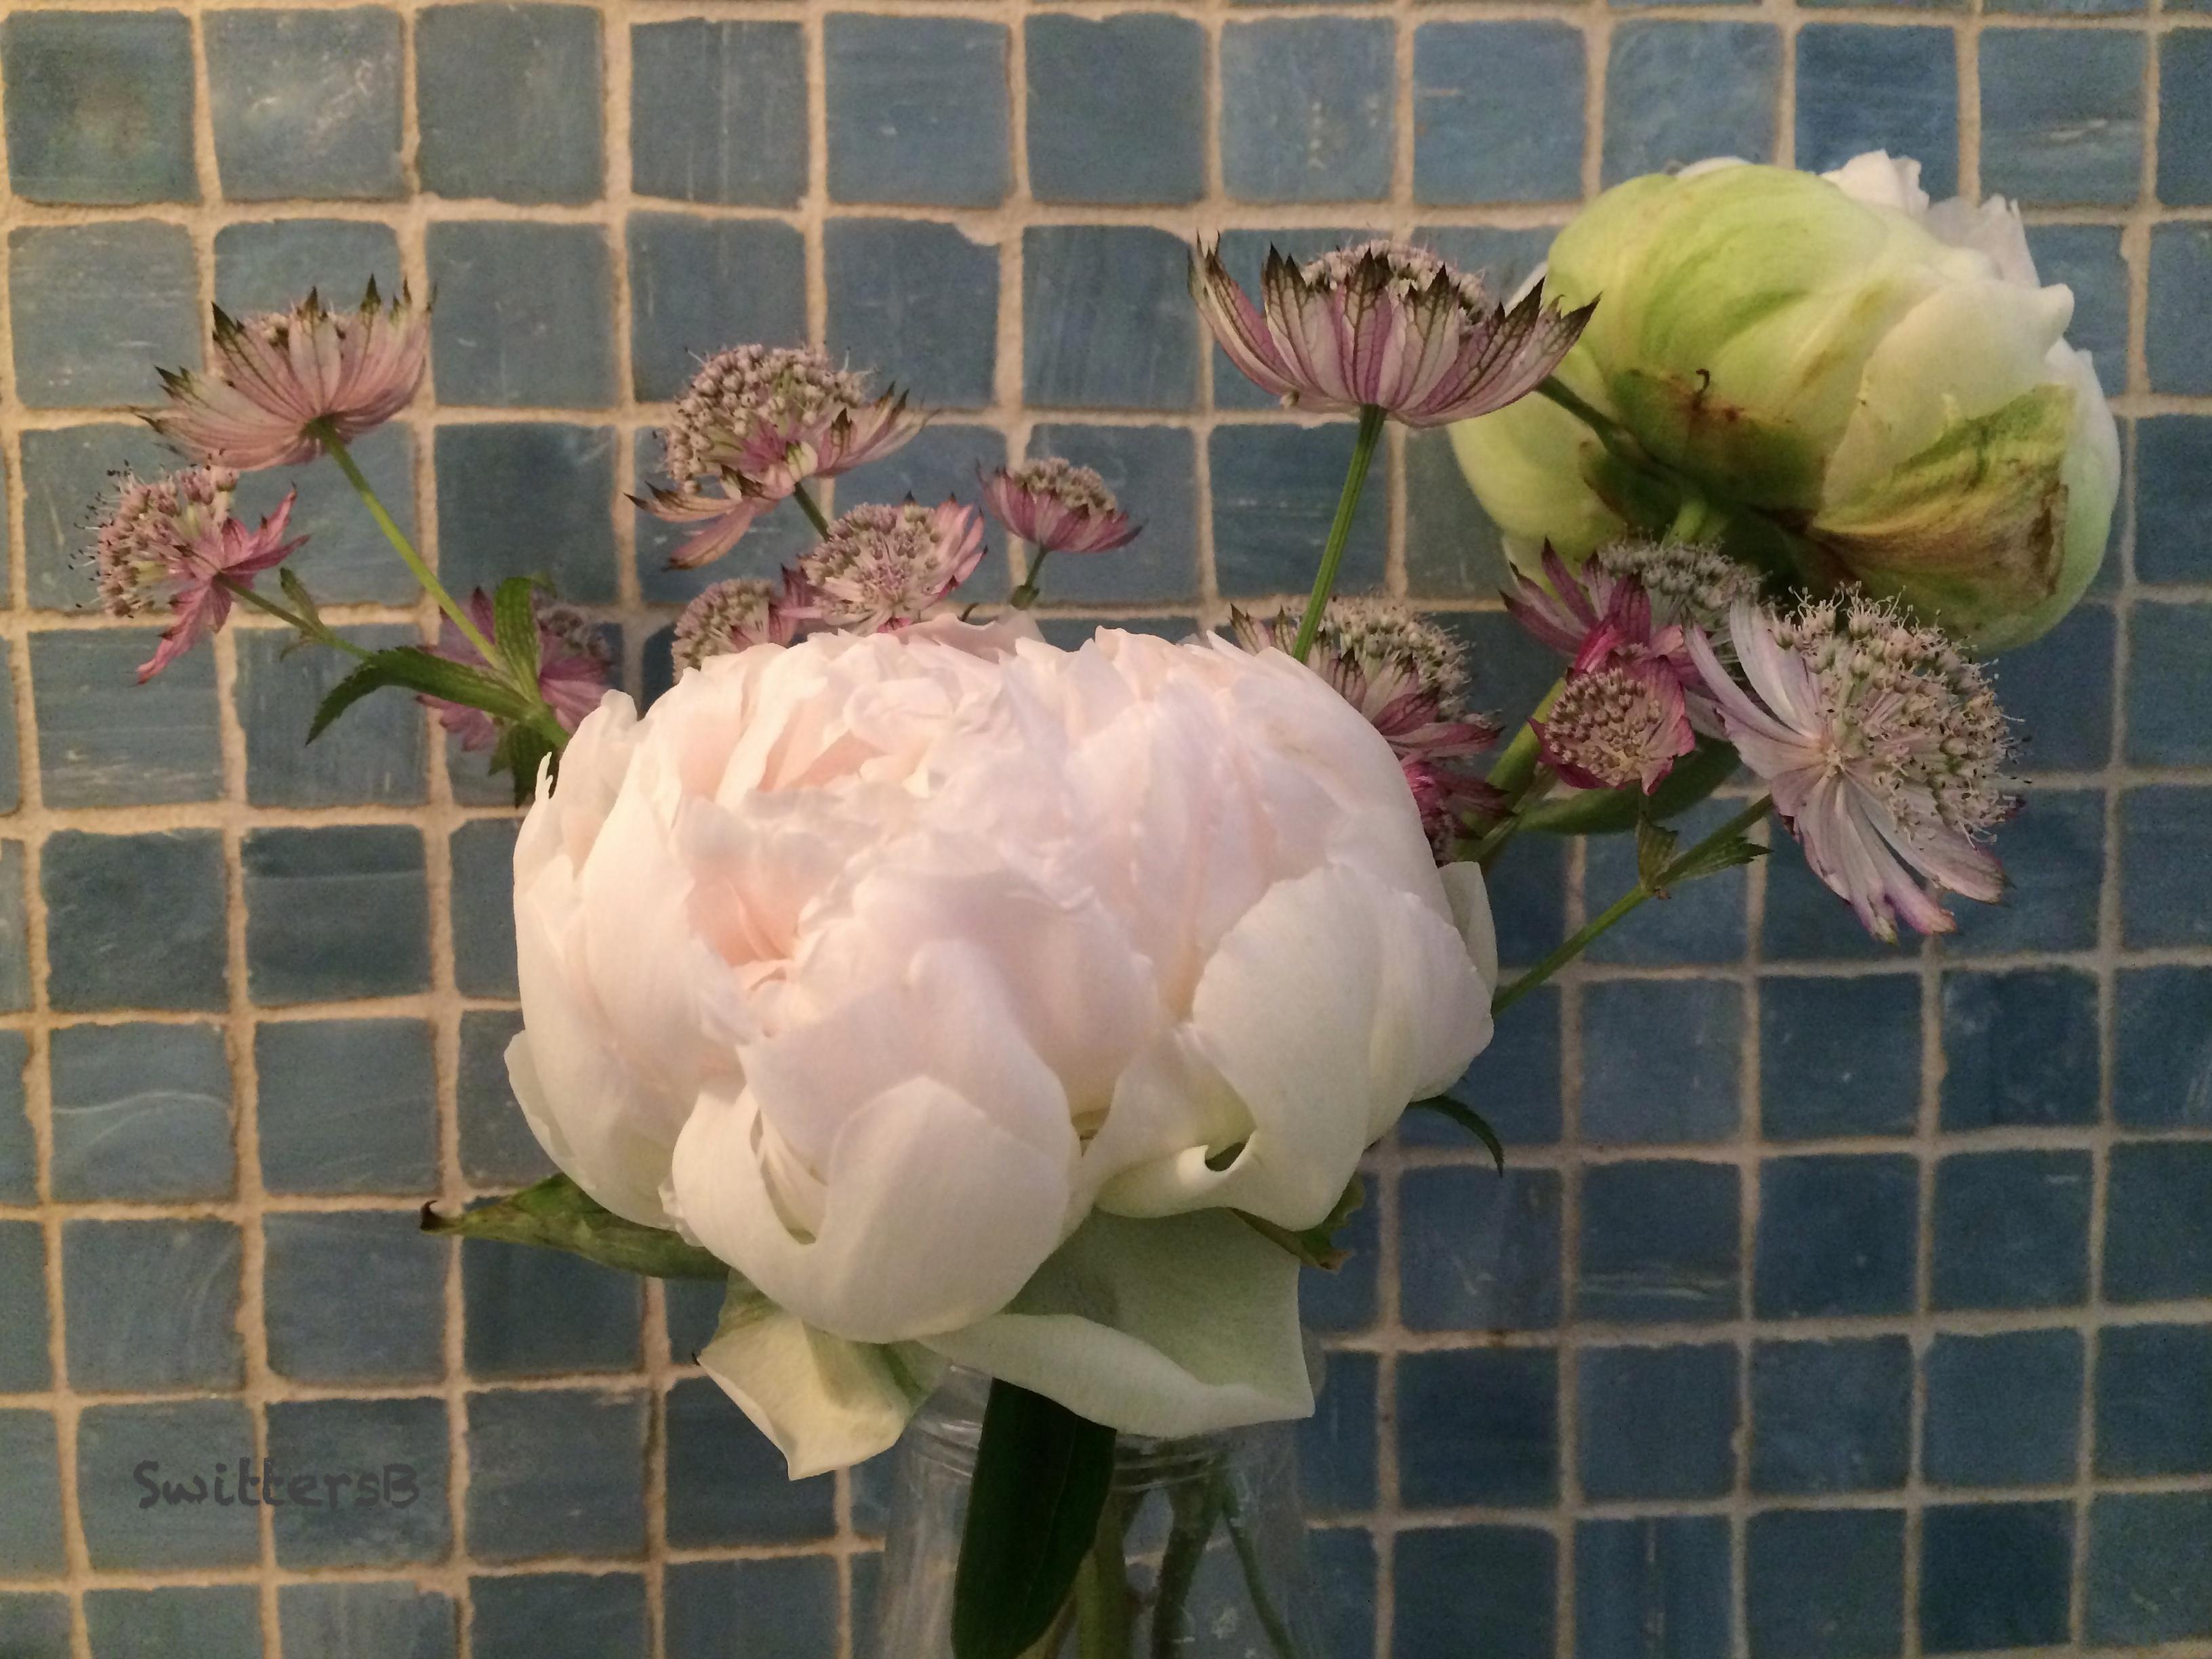 nostrana-bathroom flowers-SwittersB